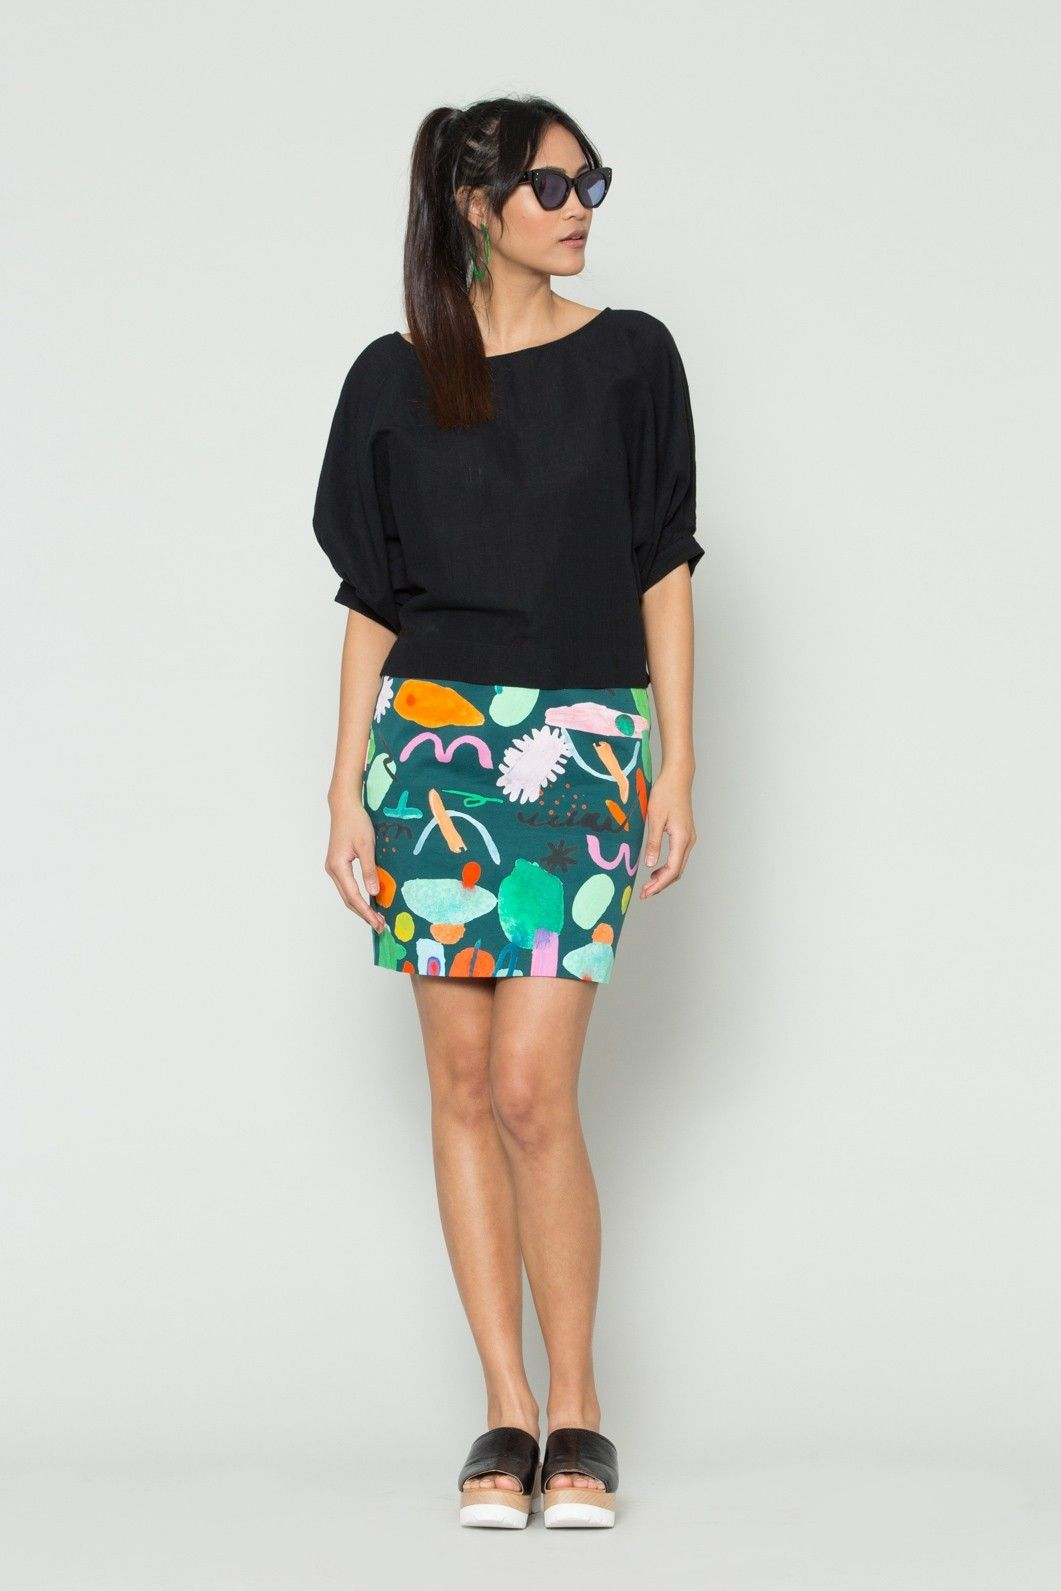 8452e72fa6 Gorman Online    Holiday Mini - Skirts - Clothing - Shop